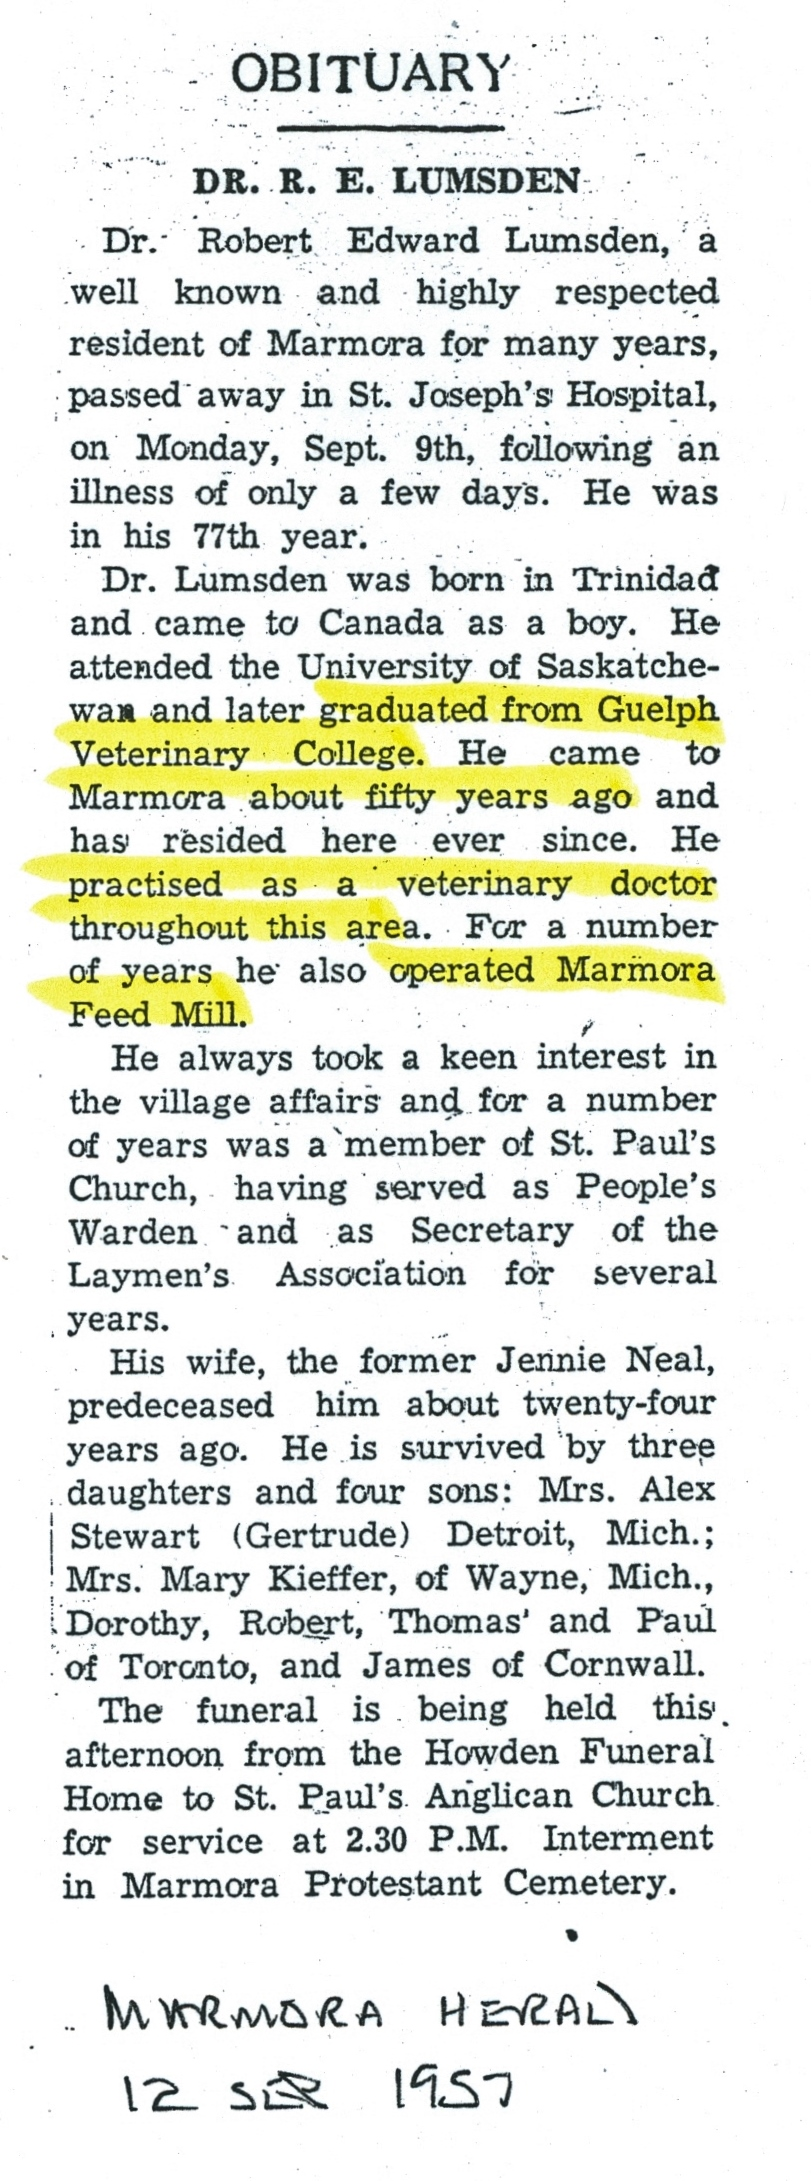 marmor herald Sept 12, 1957